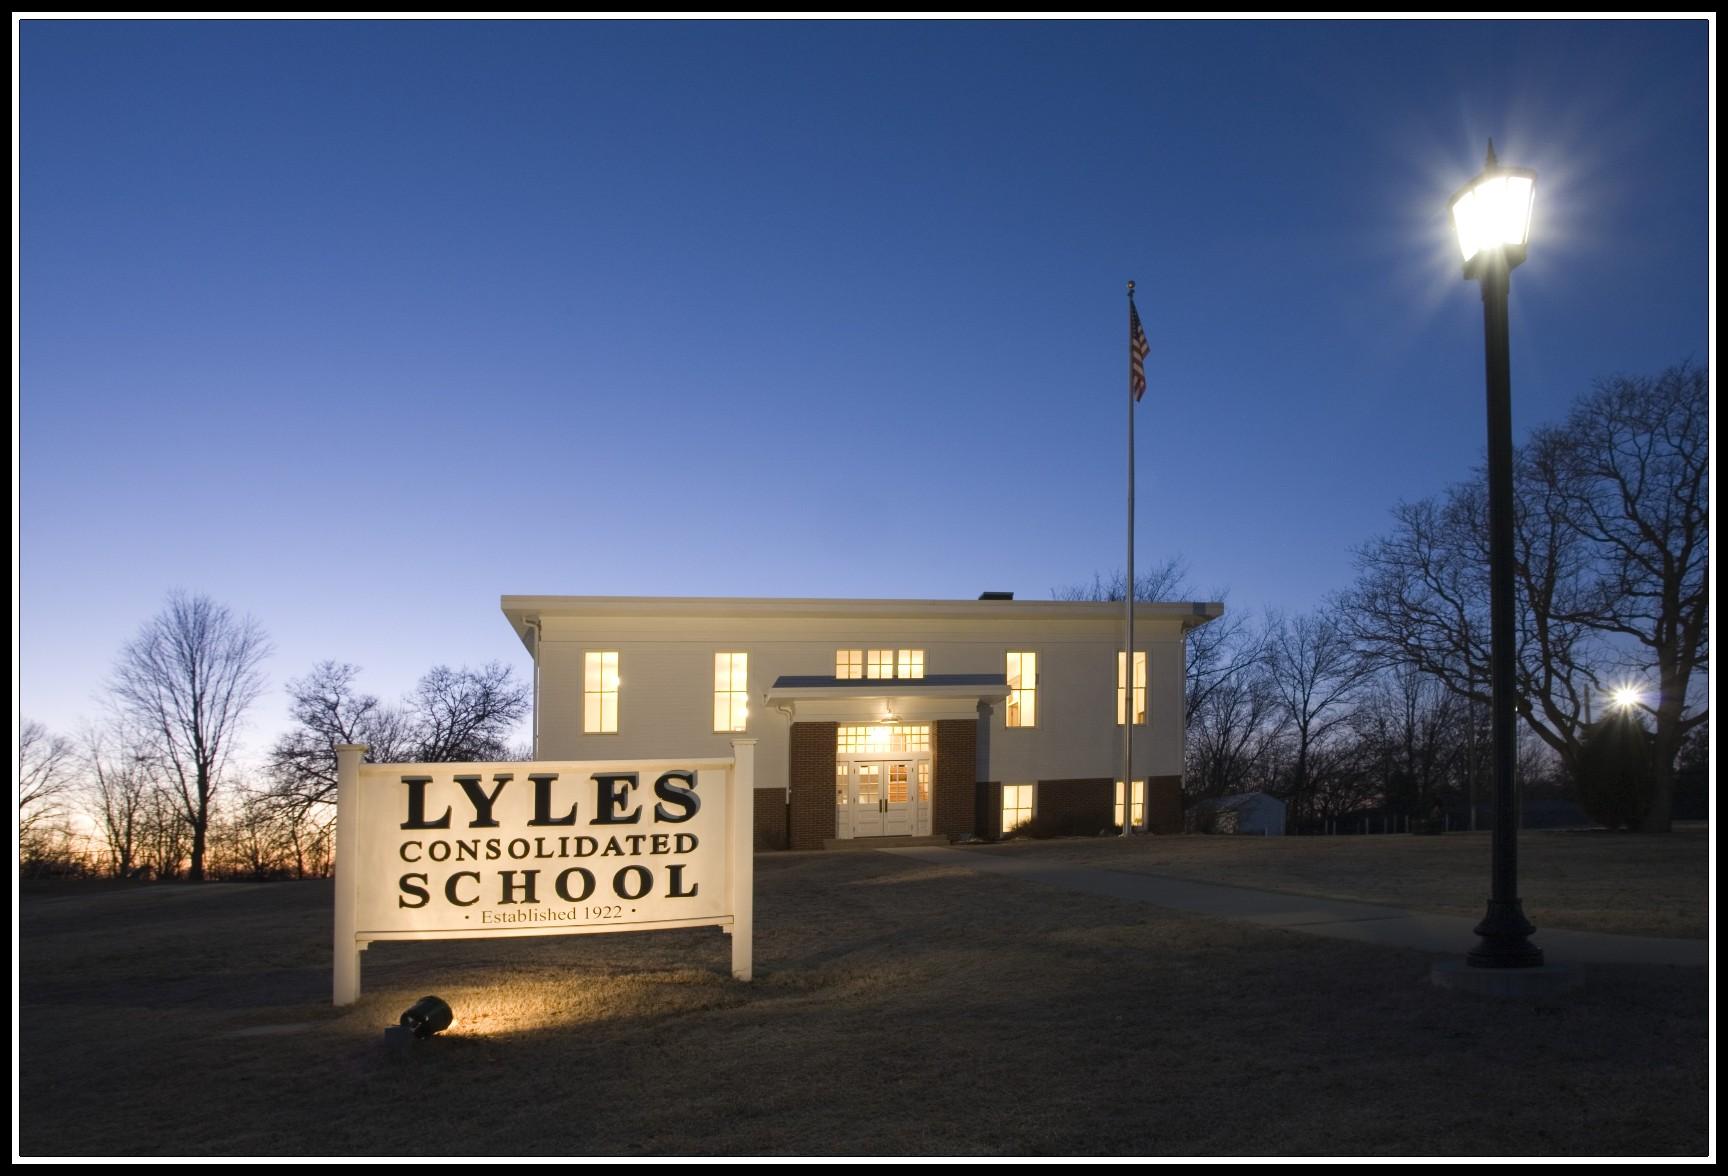 school dusk border